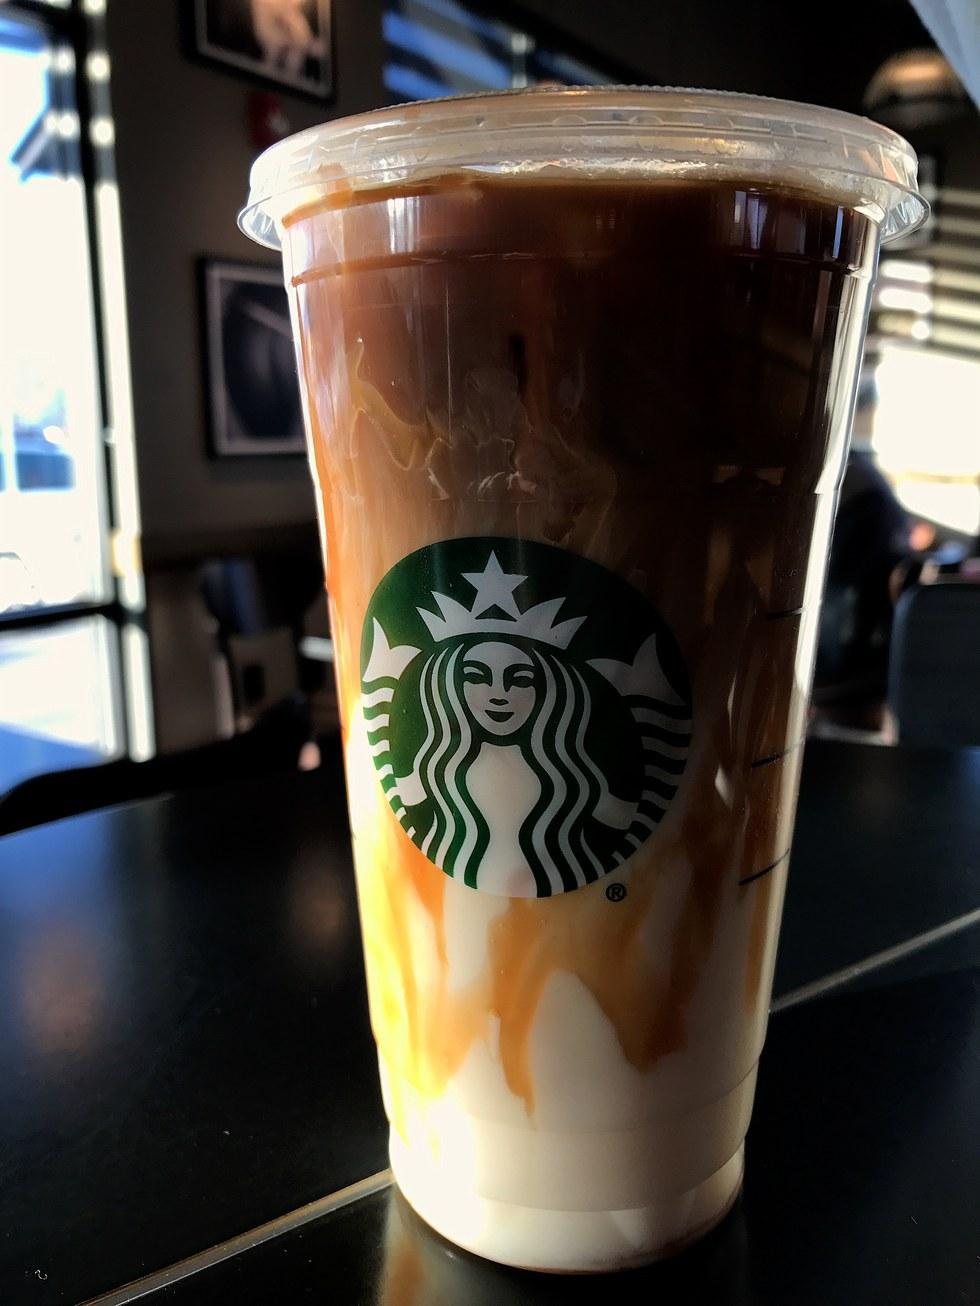 Traditional Macchiatos Vs A Starbucks Macchiato